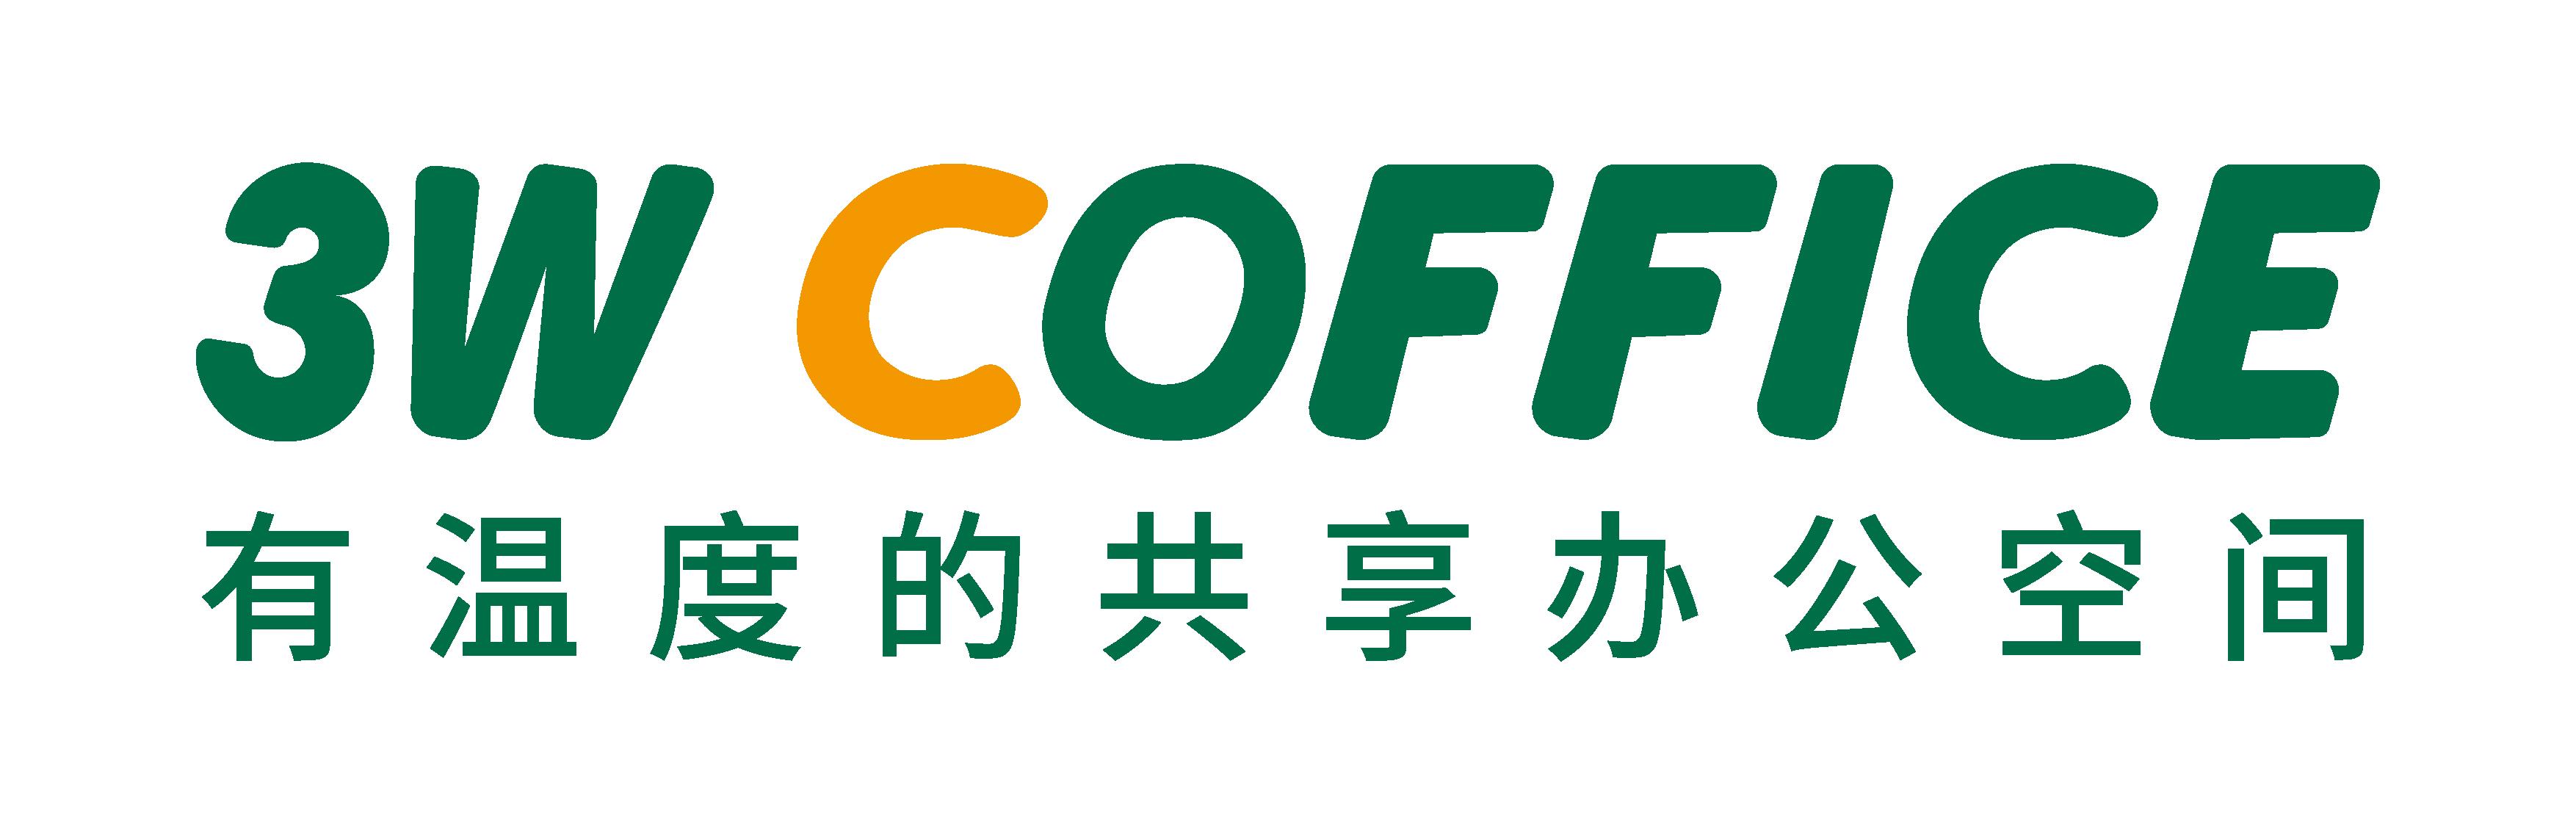 3W COFFICE logo和slogan-01副本.png